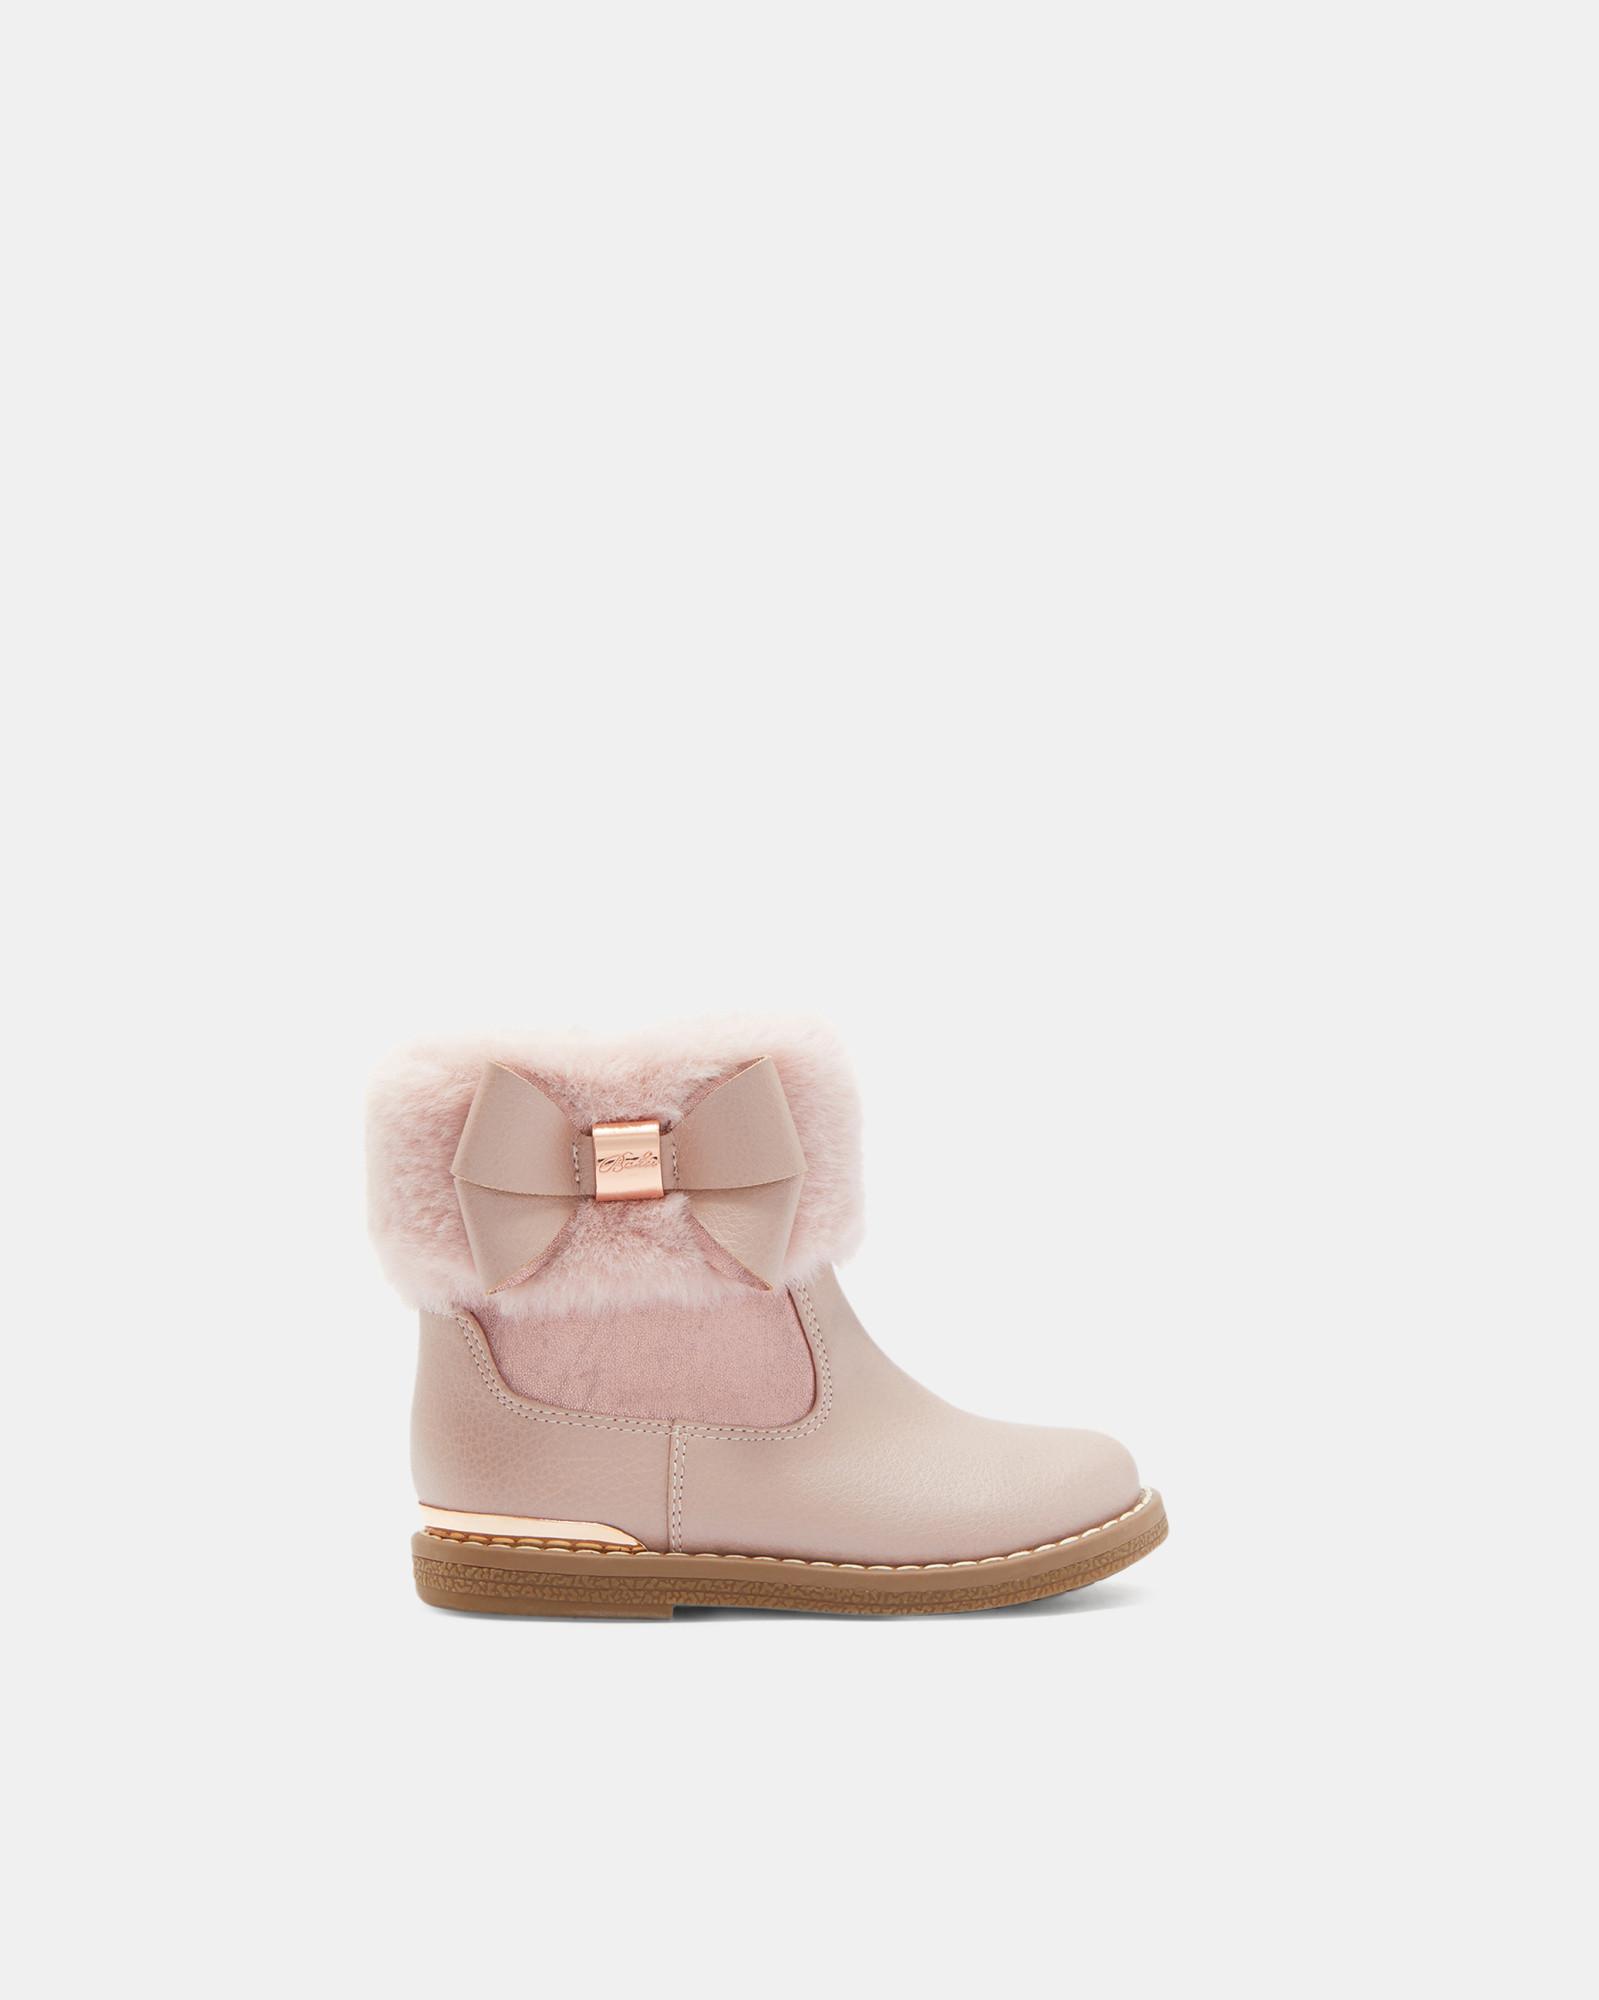 CORYIA Faux fur cuff boots #TedToToe